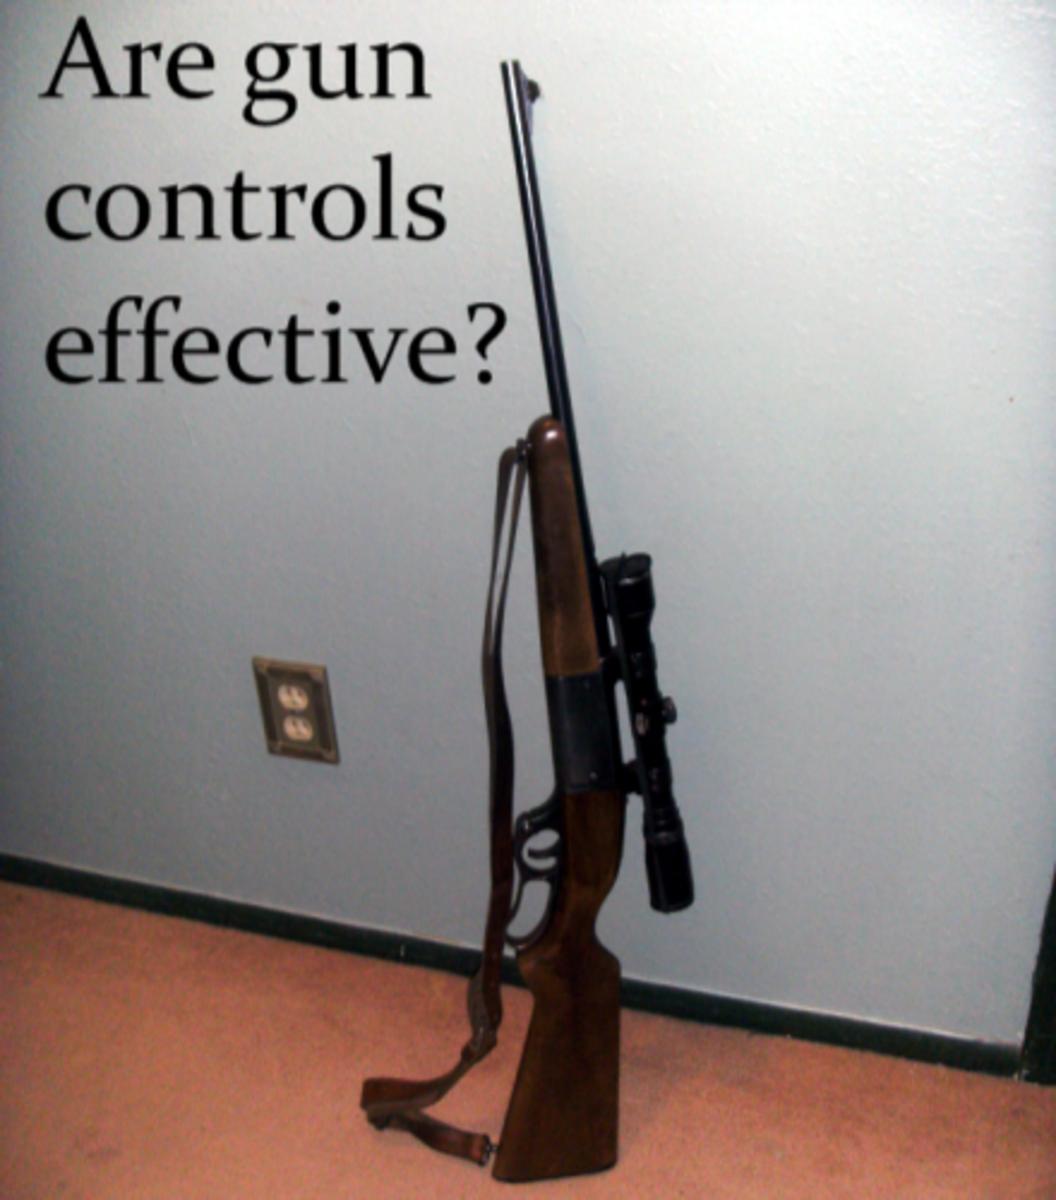 Gun Control and Crime Statistics: Does Gun Control Reduce Crime?